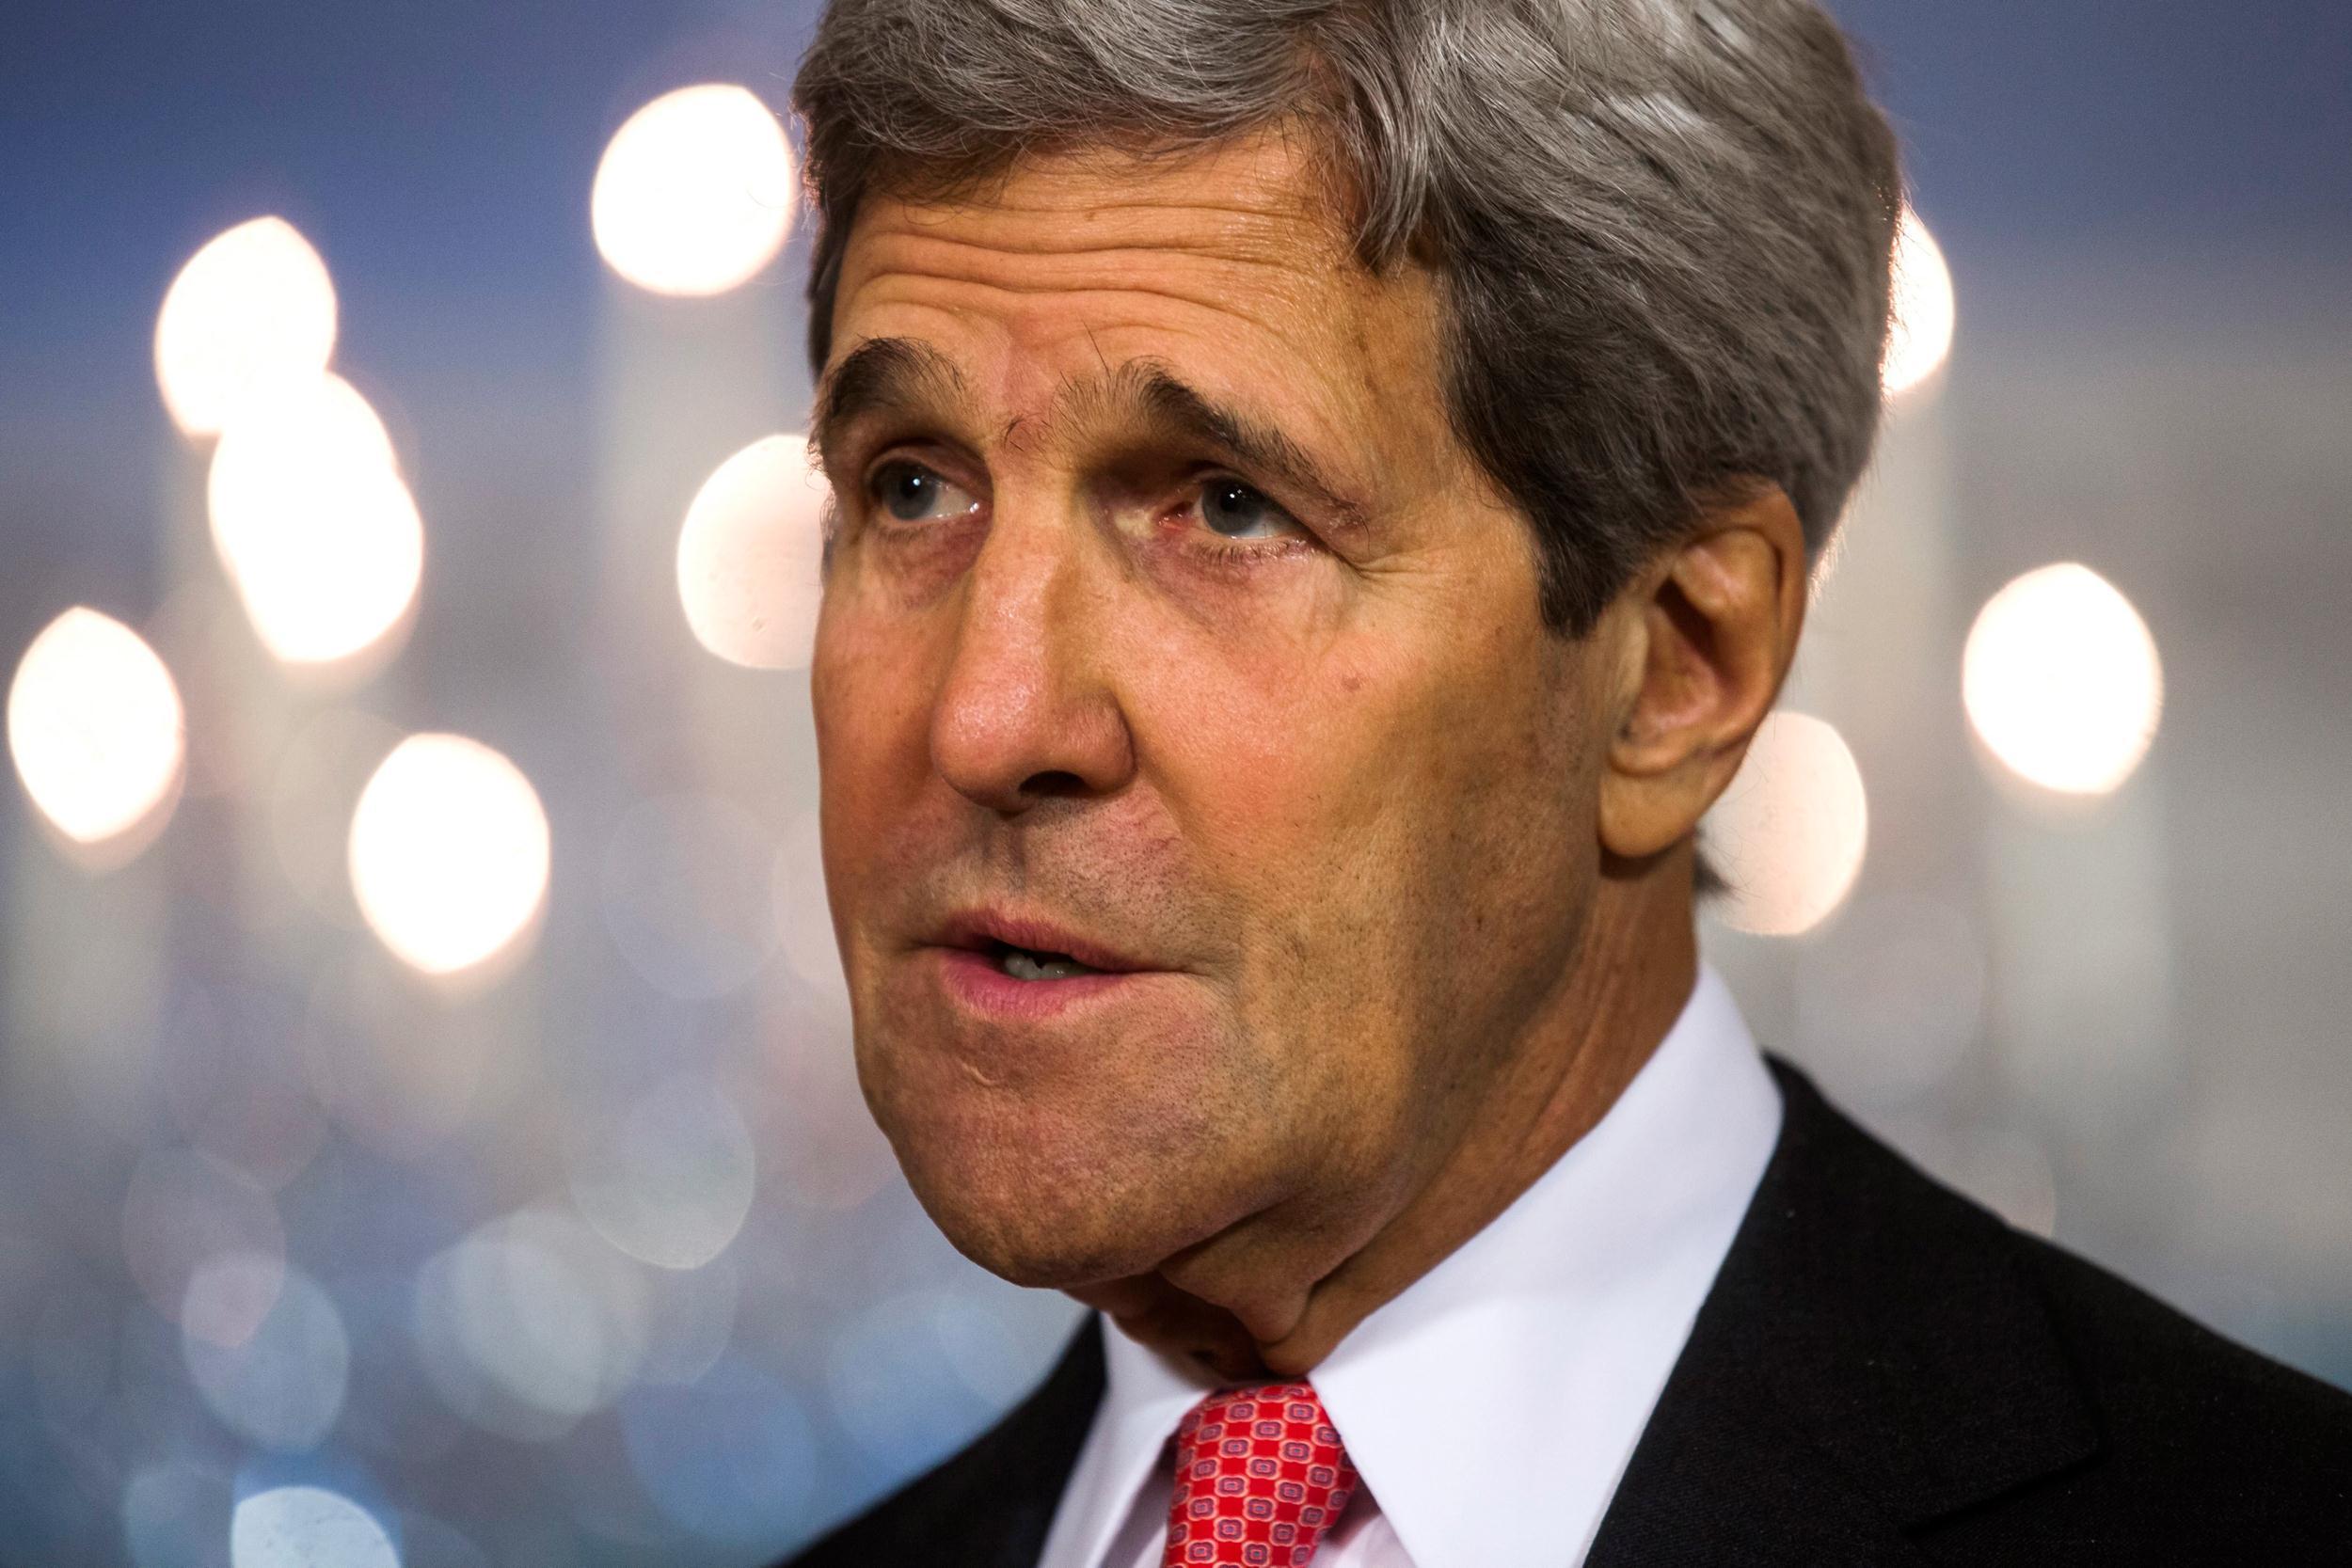 Image: US Secretary of State John Kerry